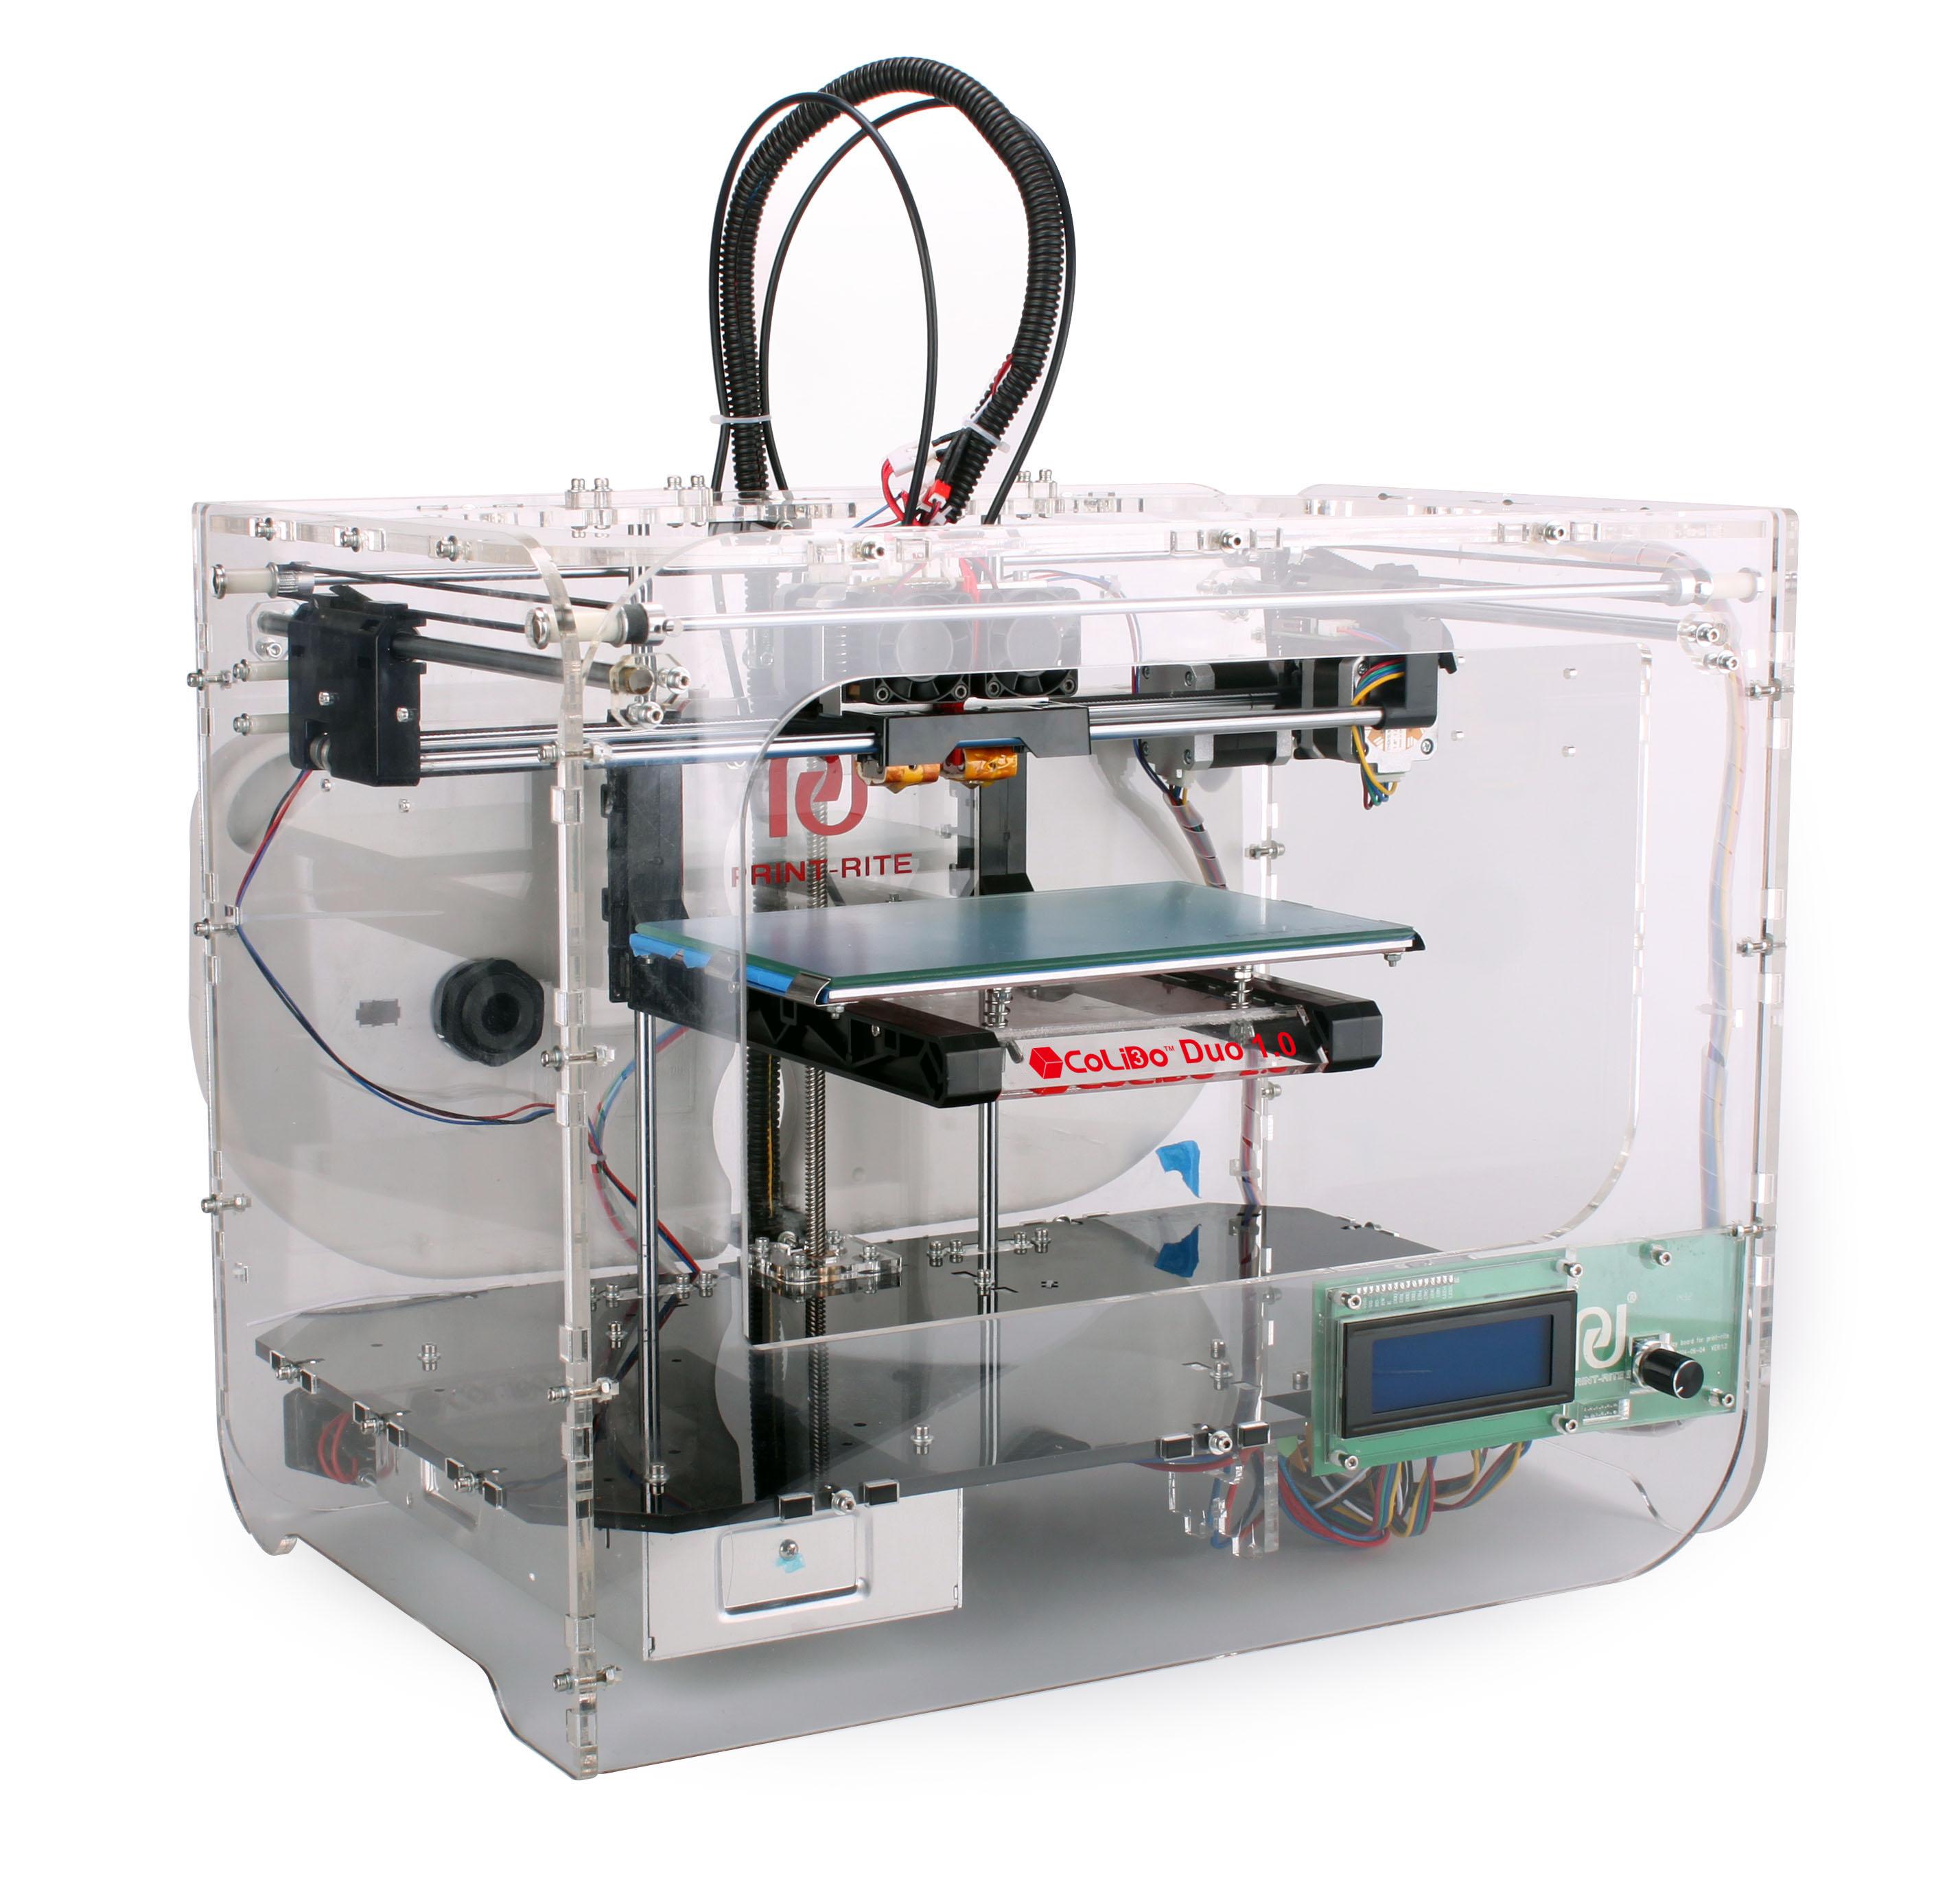 Print Rites CoLiDo Duo 10 3D Printer